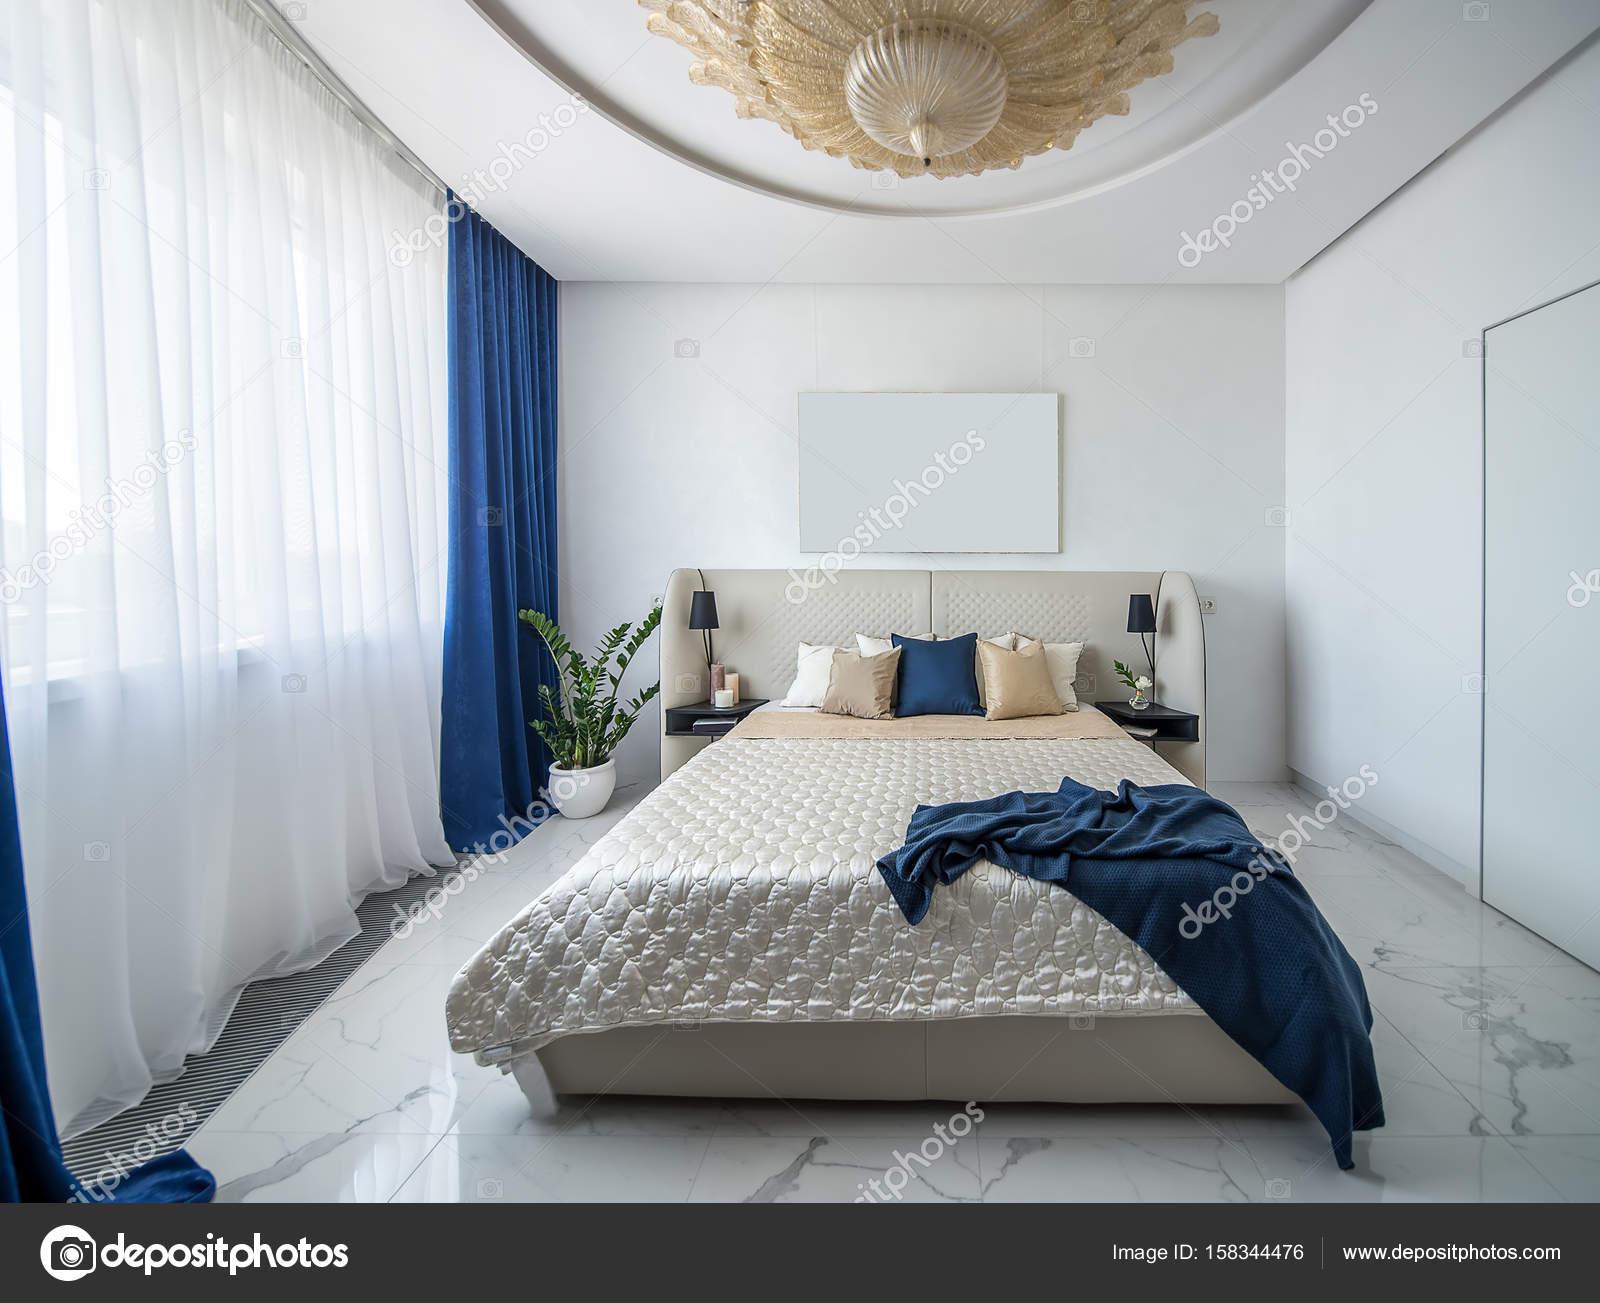 Luxe slaapkamer in moderne stijl u2014 stockfoto © bezikus #158344476